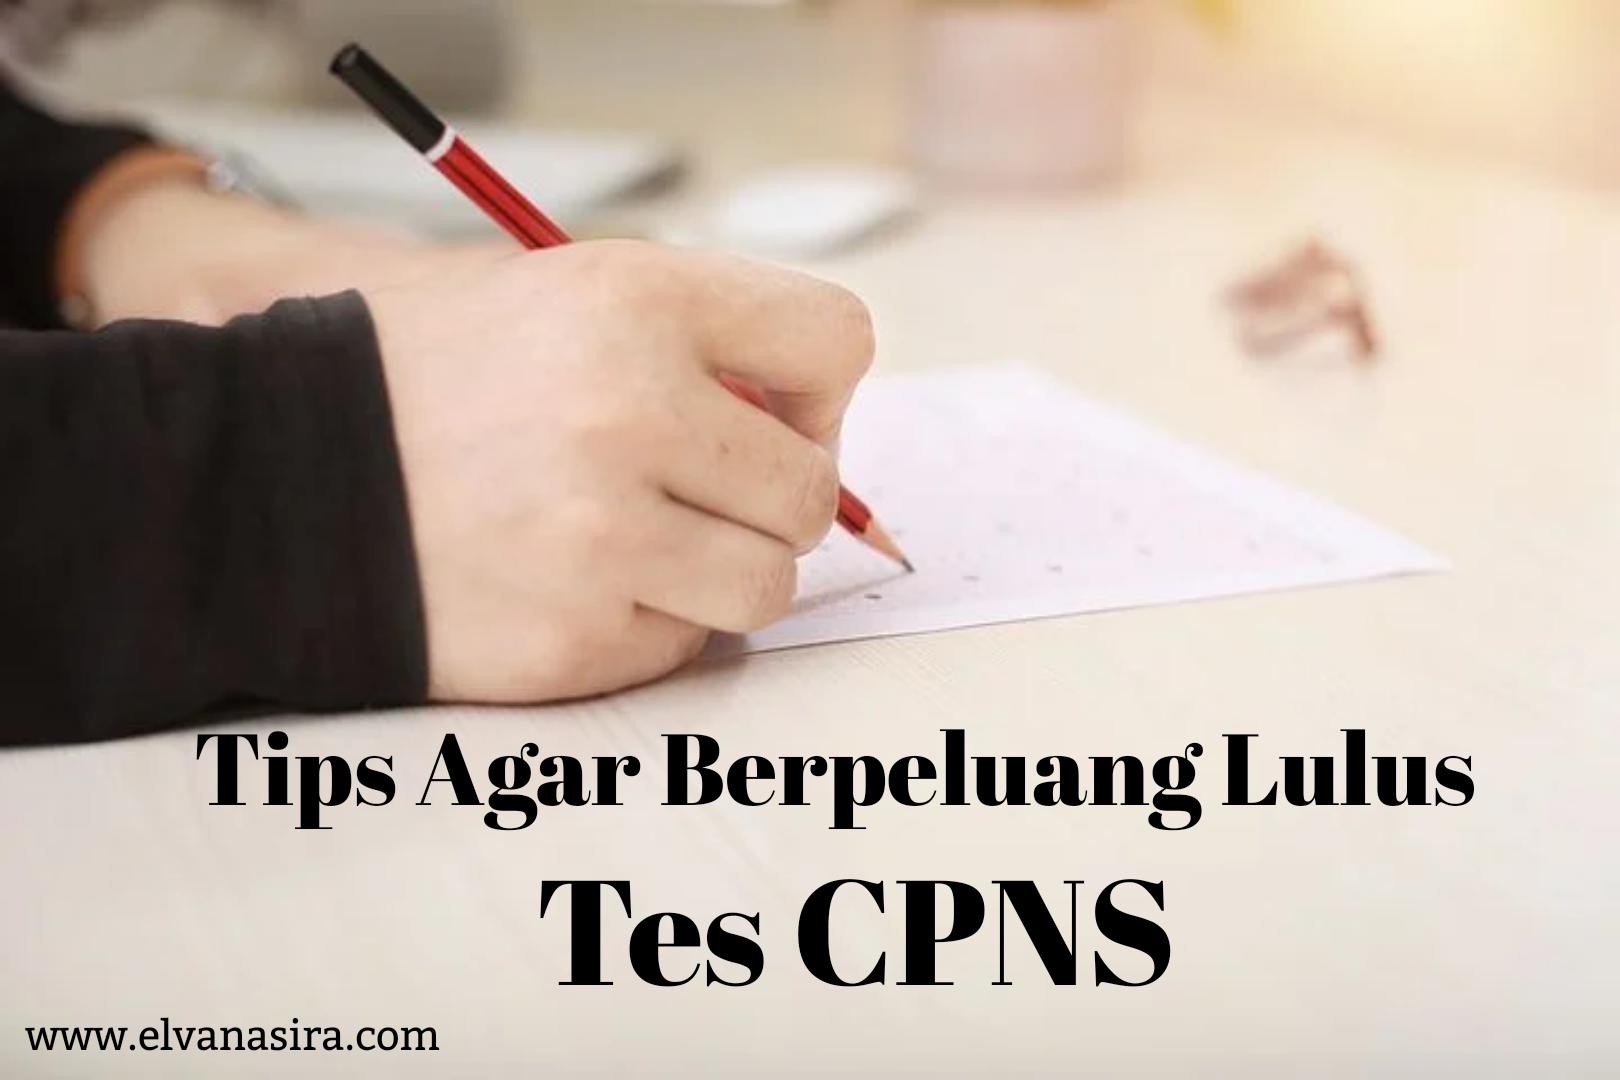 Tips agar berpeluang lulus tes CPNS